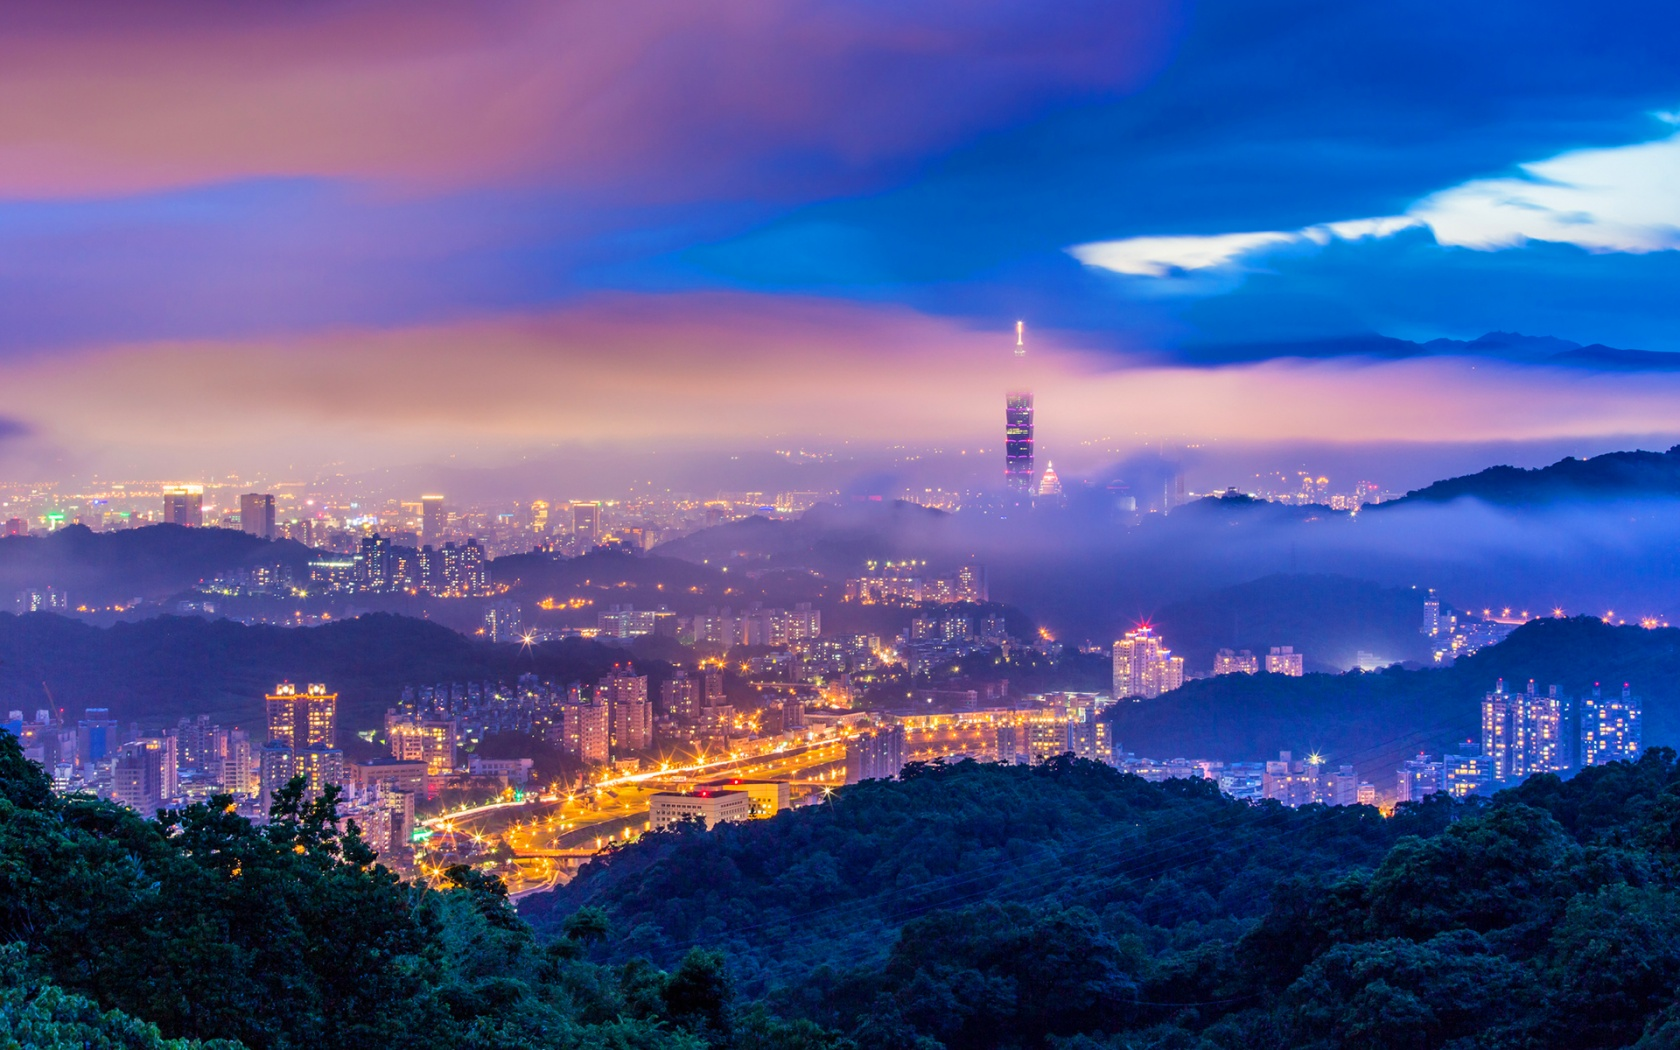 Stunning Taiwan Wallpaper 30486 1680x1050 px